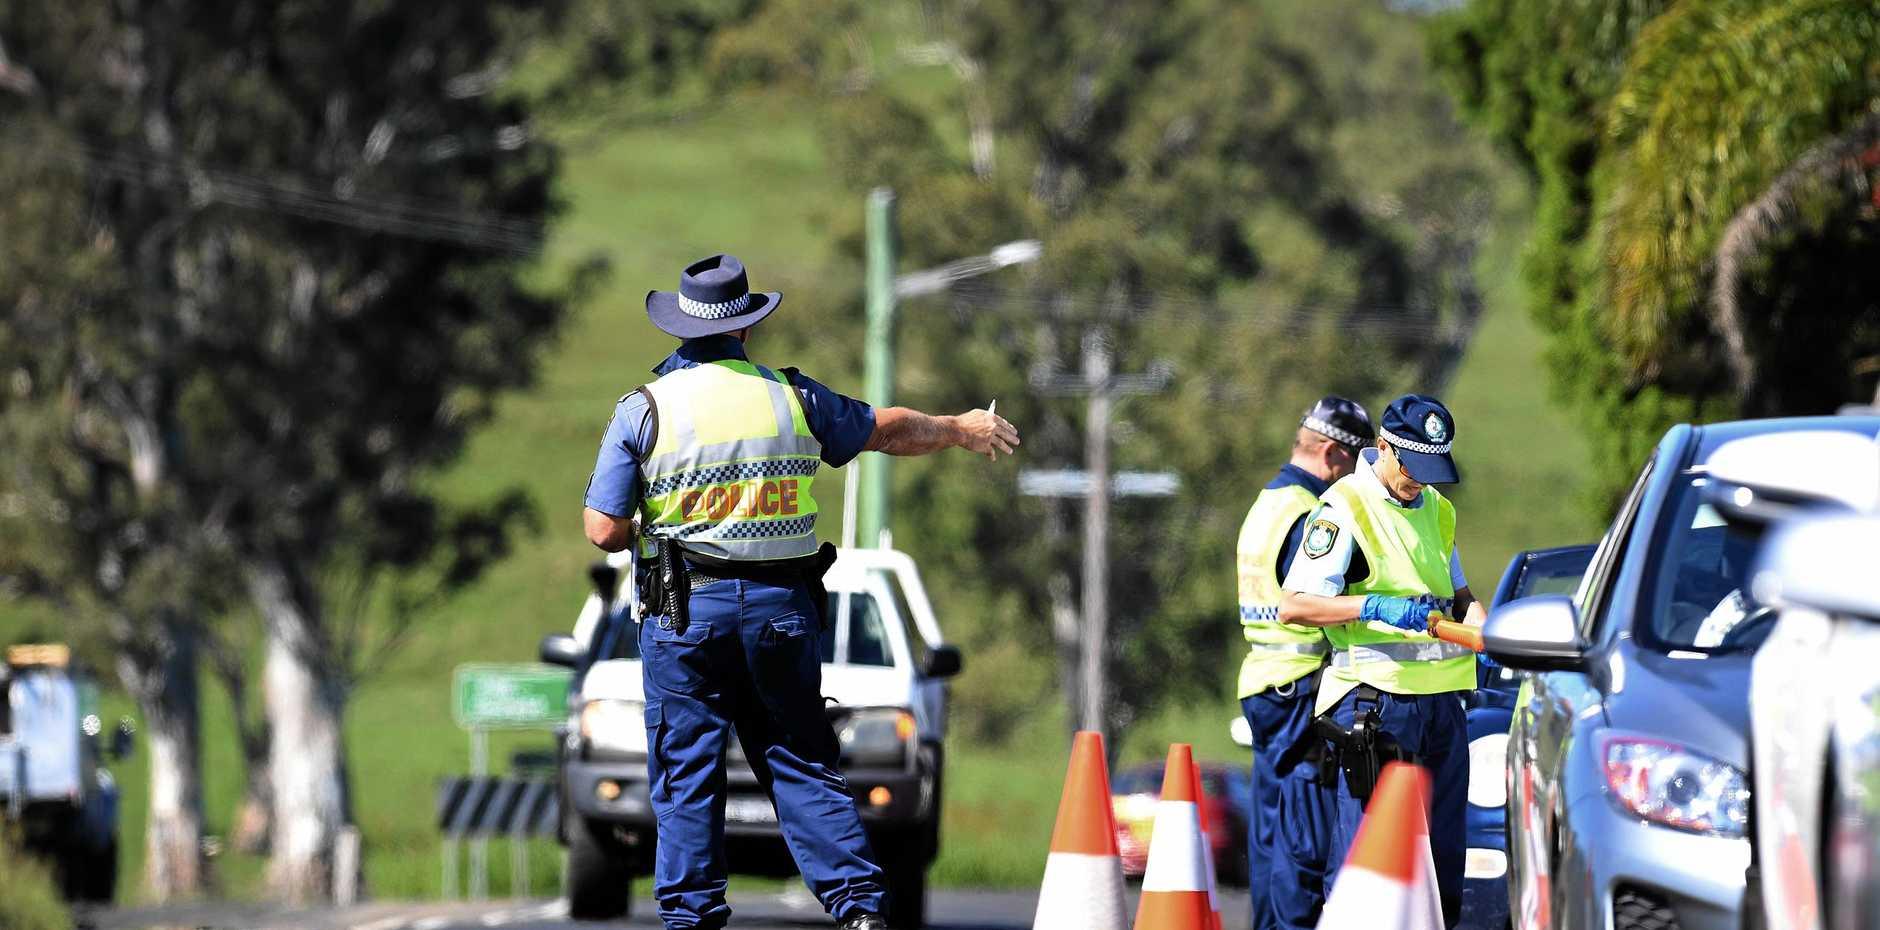 Police conducting roadside testing on the way to MardiGrass 2019 near Goolmangar.